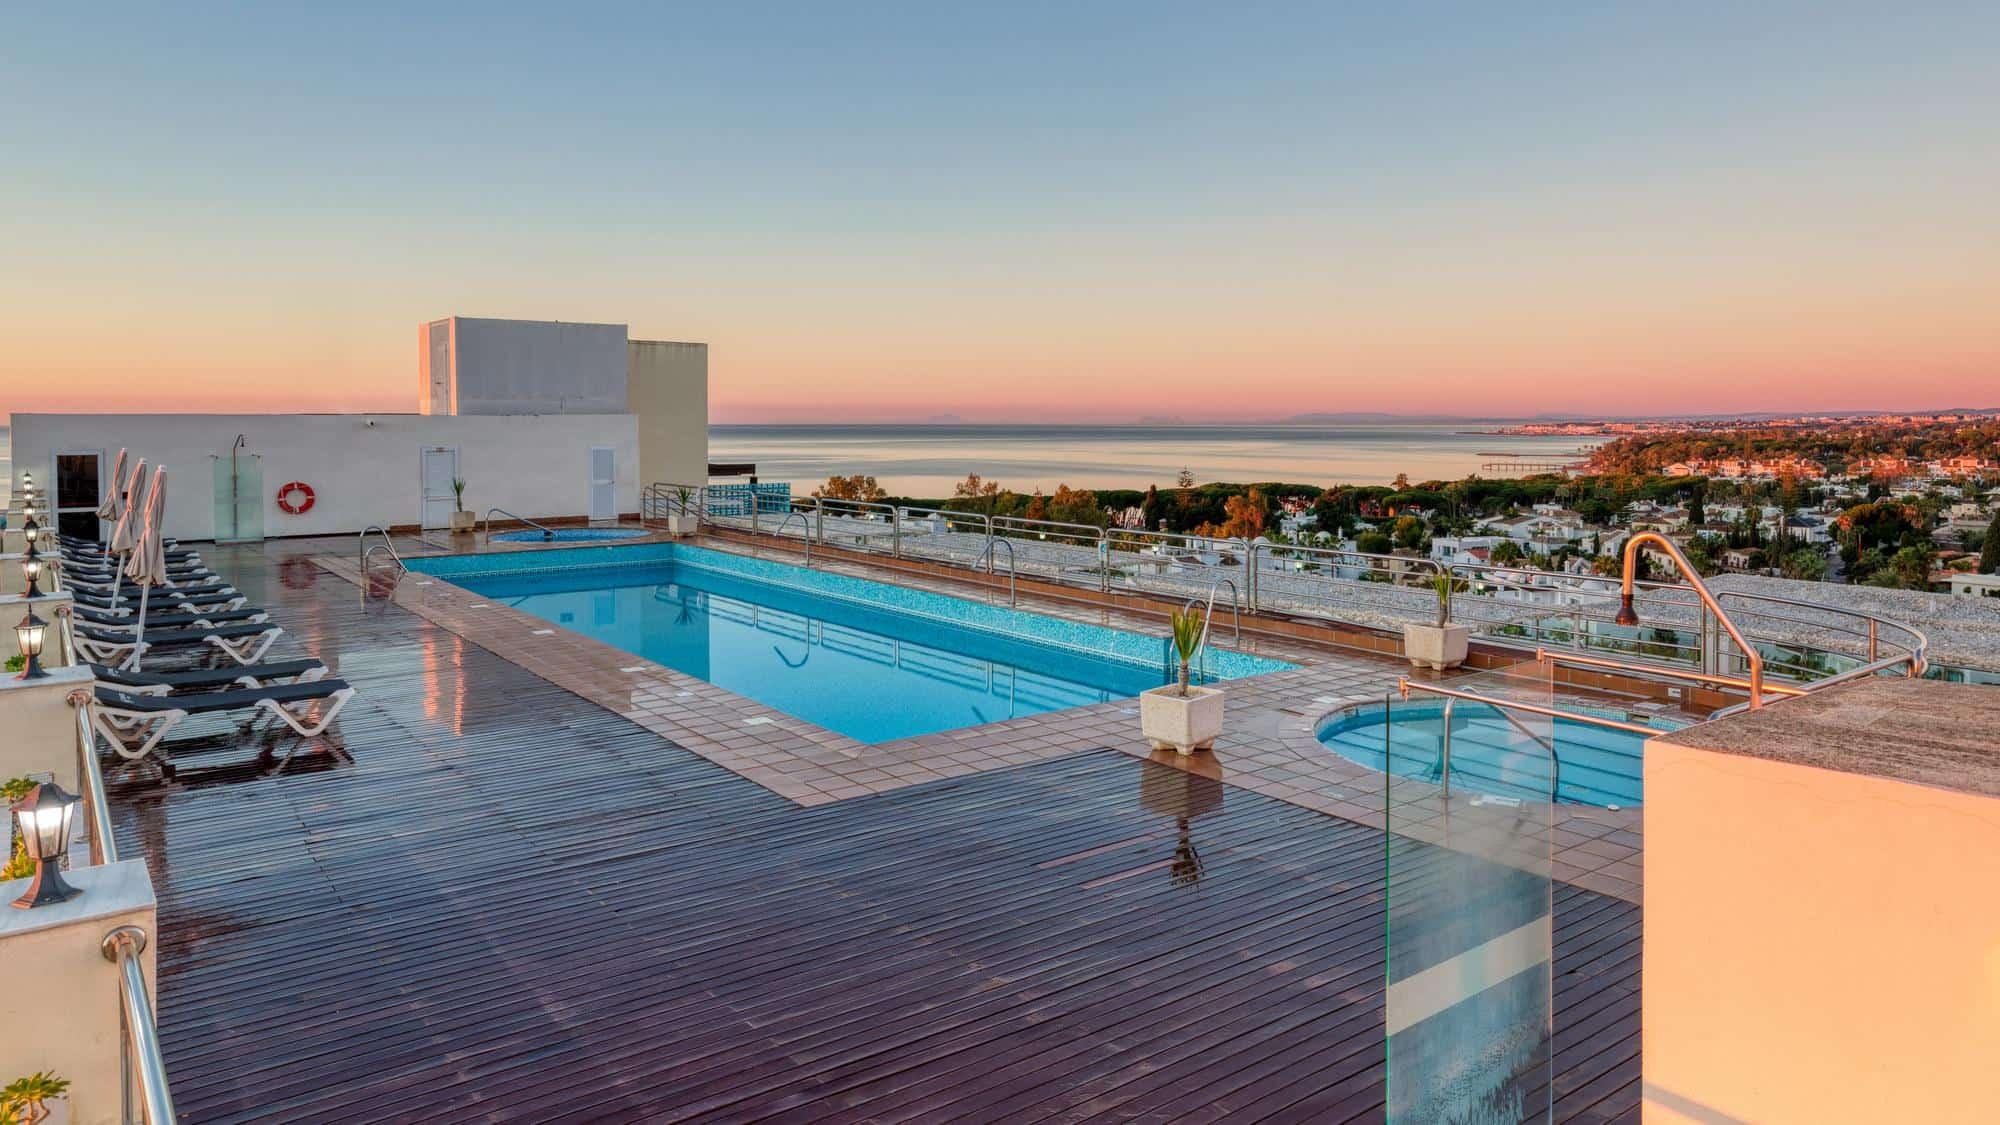 senator marbella spa hotel (4 star) golf accomodation